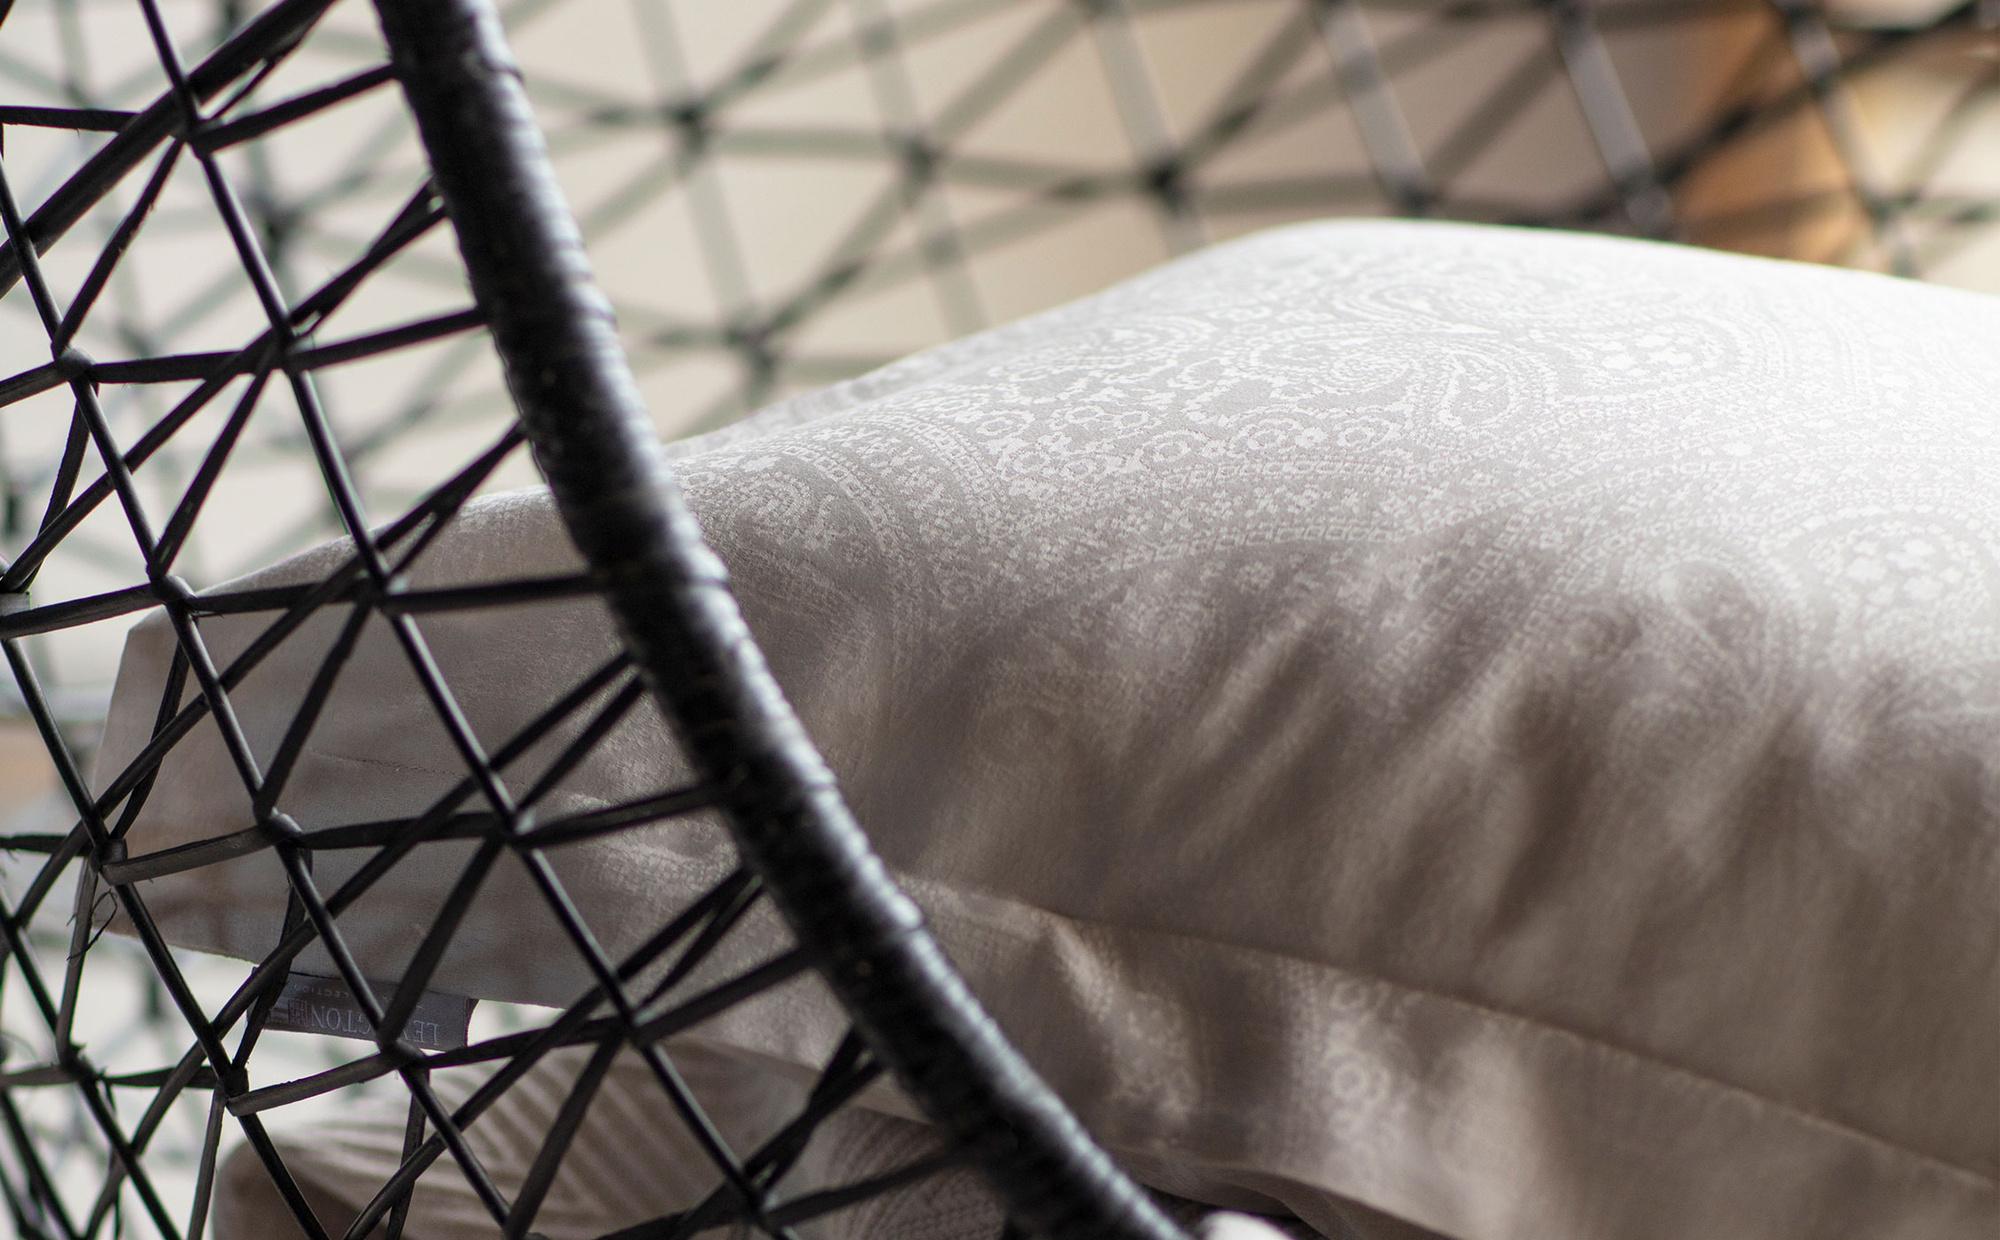 Hotel Sateen Jacquard Lt Beige Pillowcase